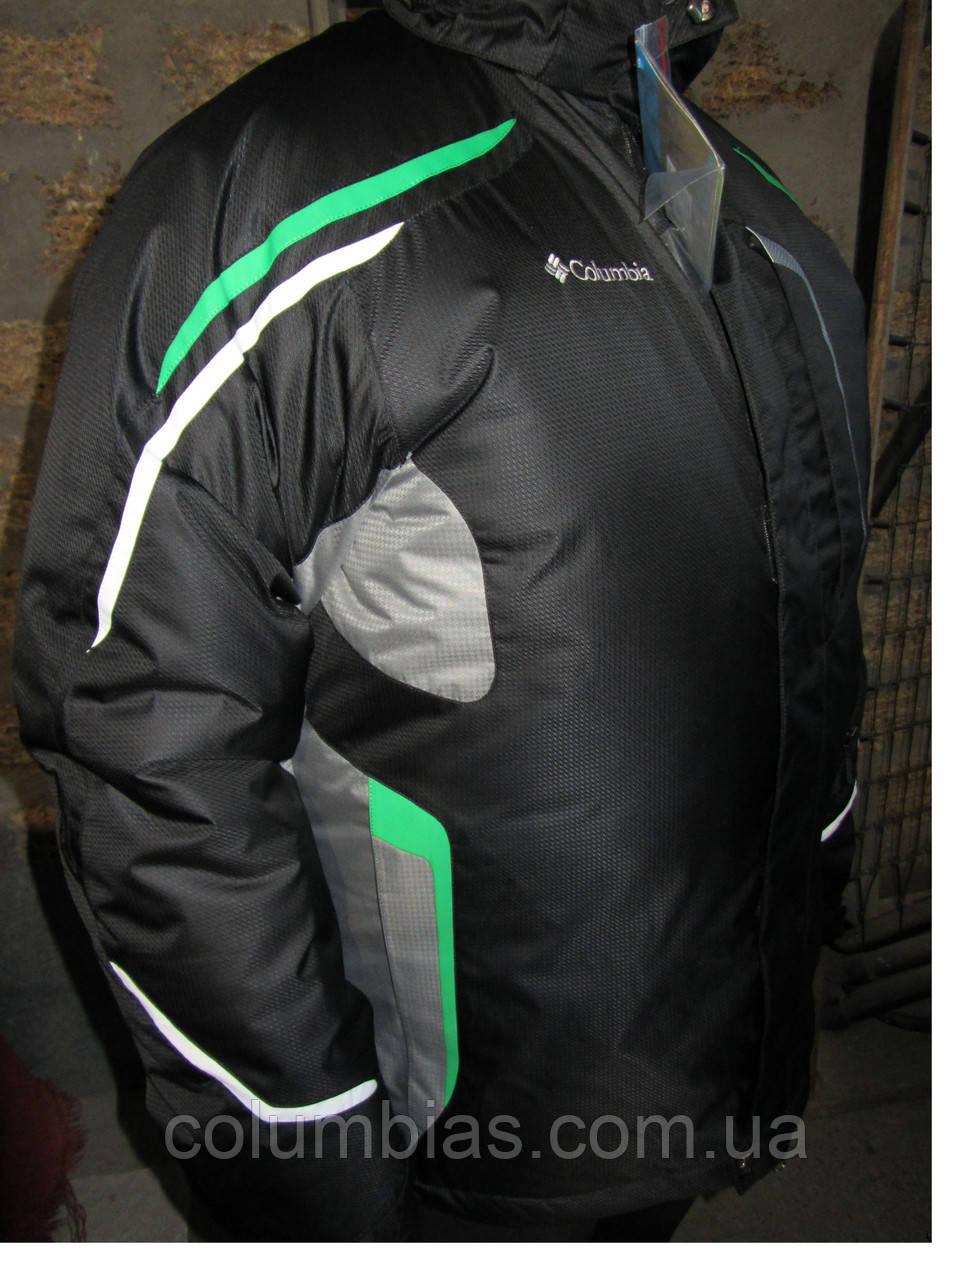 Columbua большие размеры лыжных курток